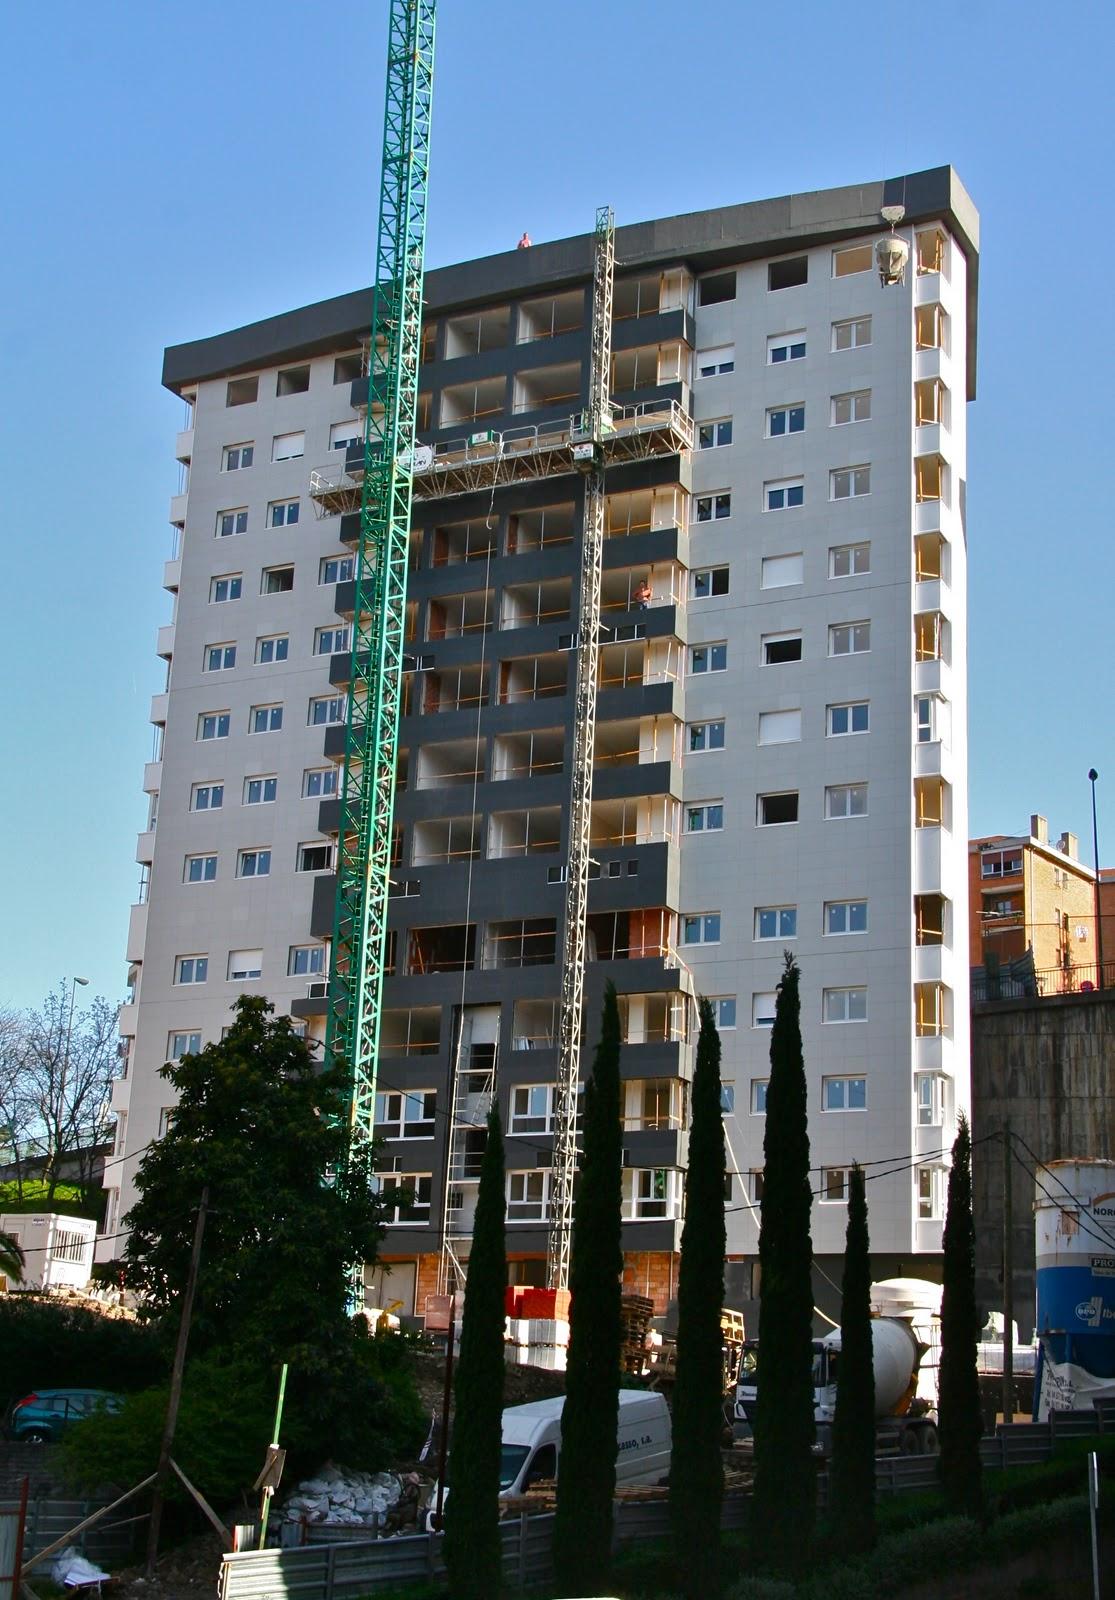 Pr ximamente visita los pisos piloto zabala arquitectos - Arquitectos madrid 2 0 ...